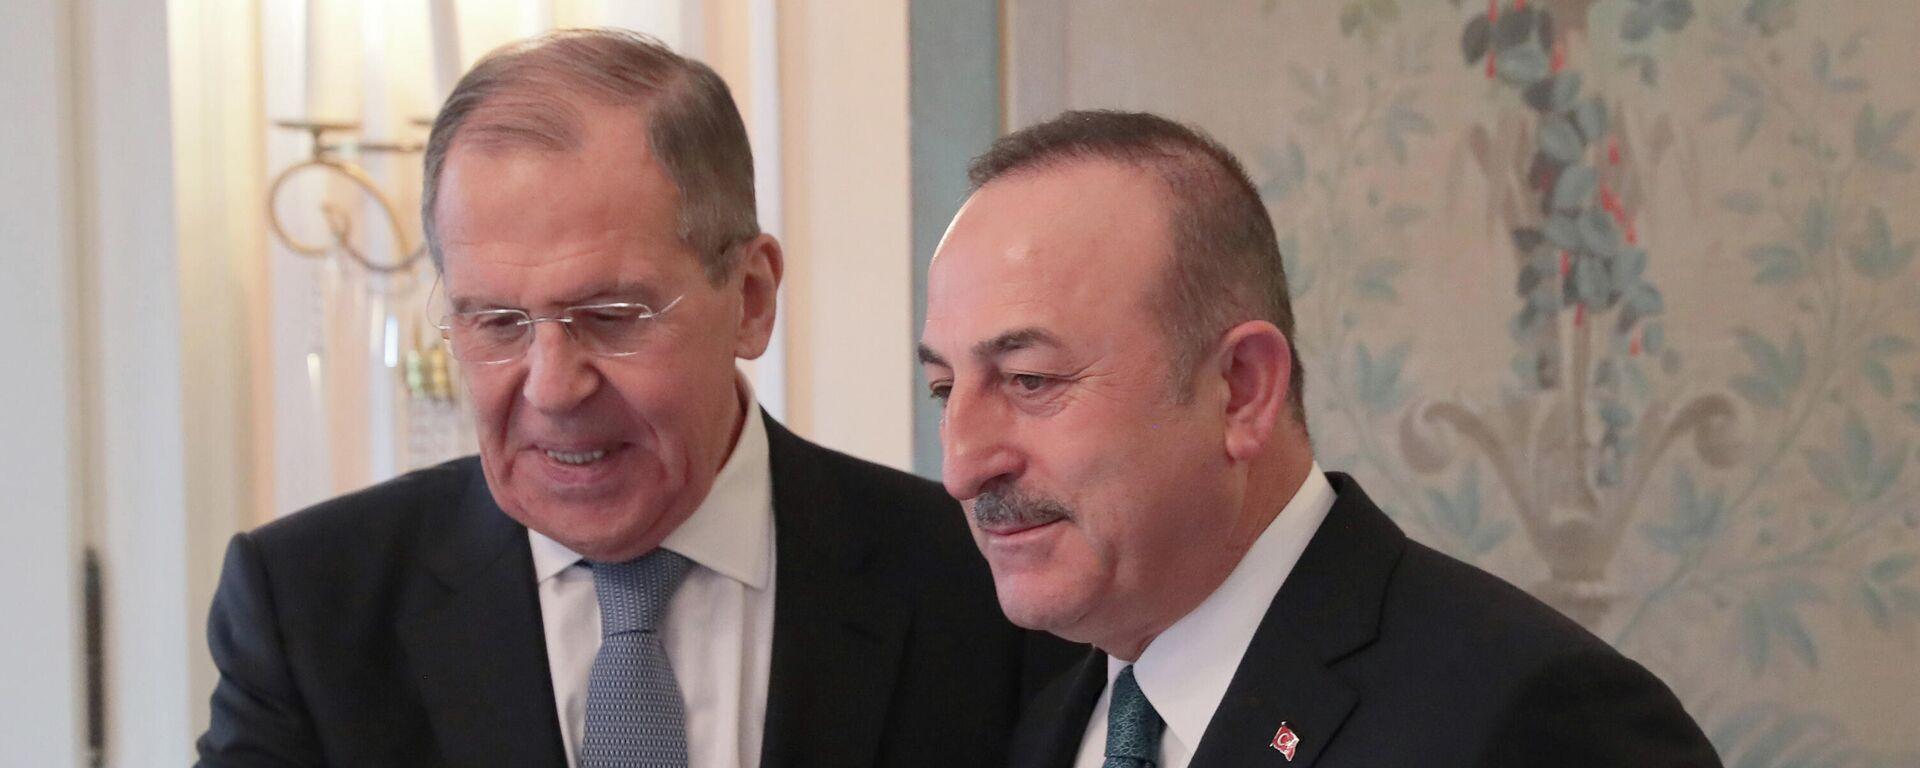 Ministri spoljnih poslova Rusije i Turske, Sergej Lavrov i Mevlut Čavušoglu - Sputnik Srbija, 1920, 18.08.2021